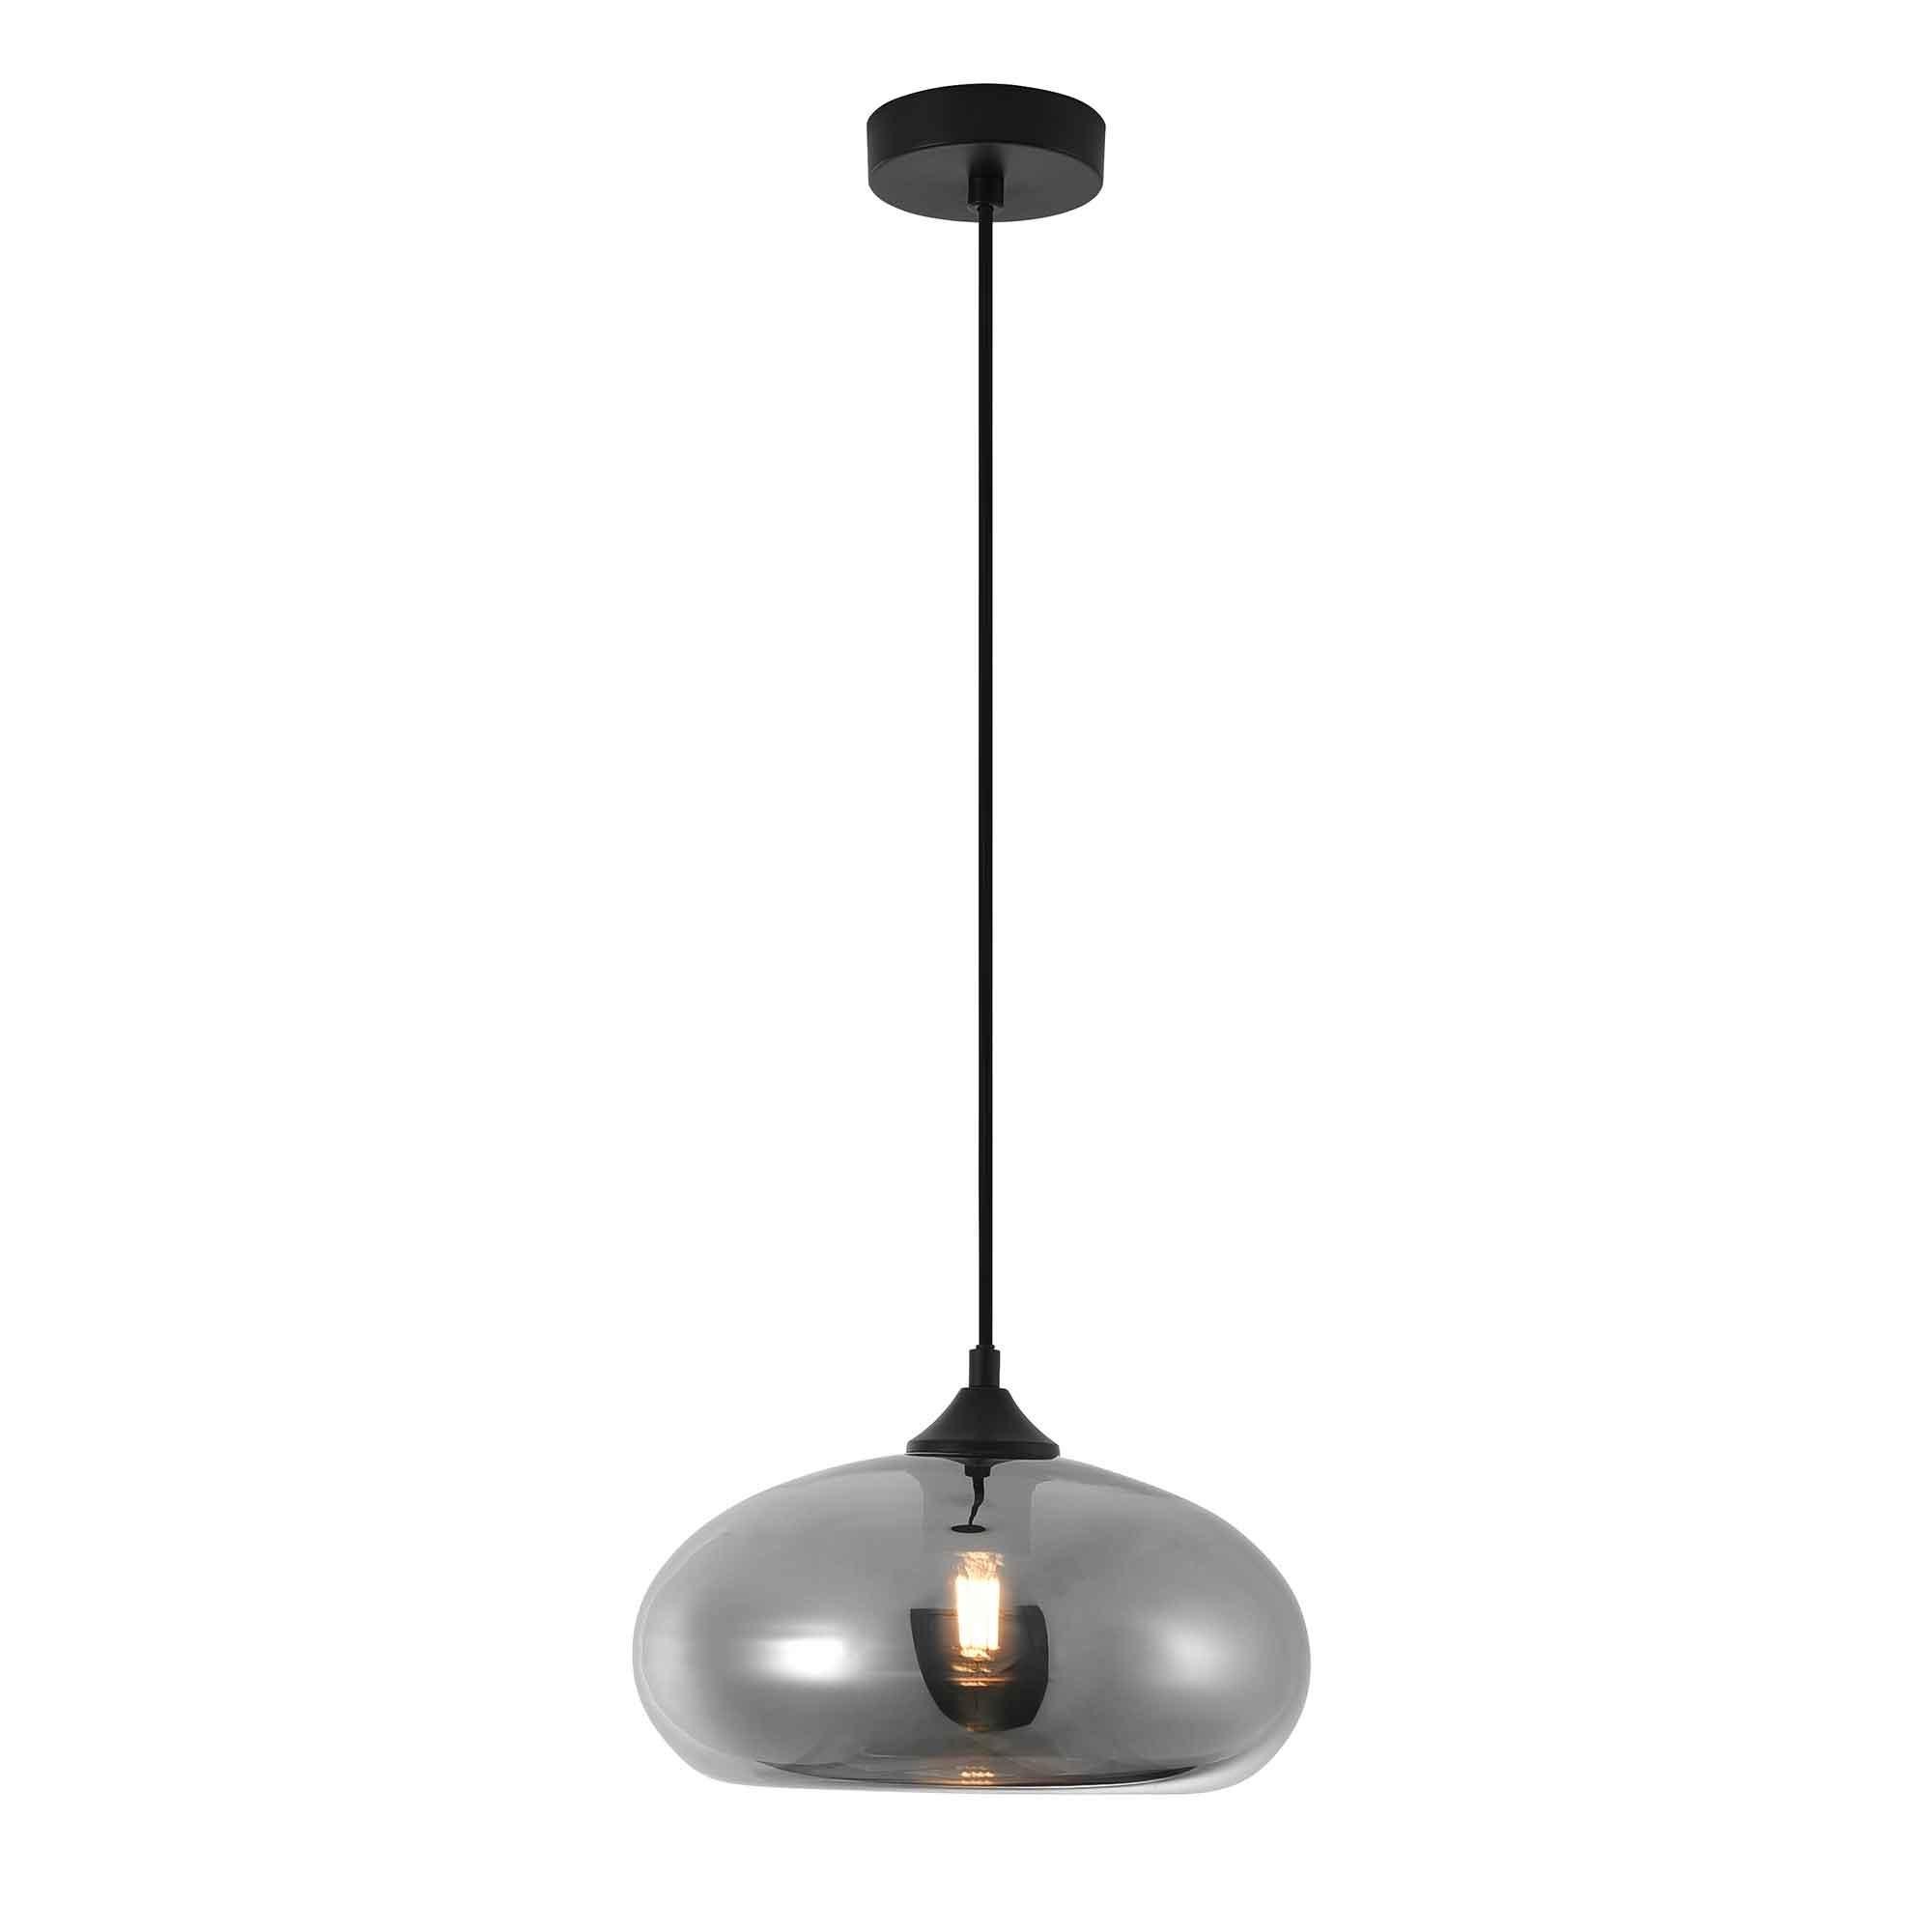 Artdelight Hanglamp Paradise Ø 28 cm rook glas zwart